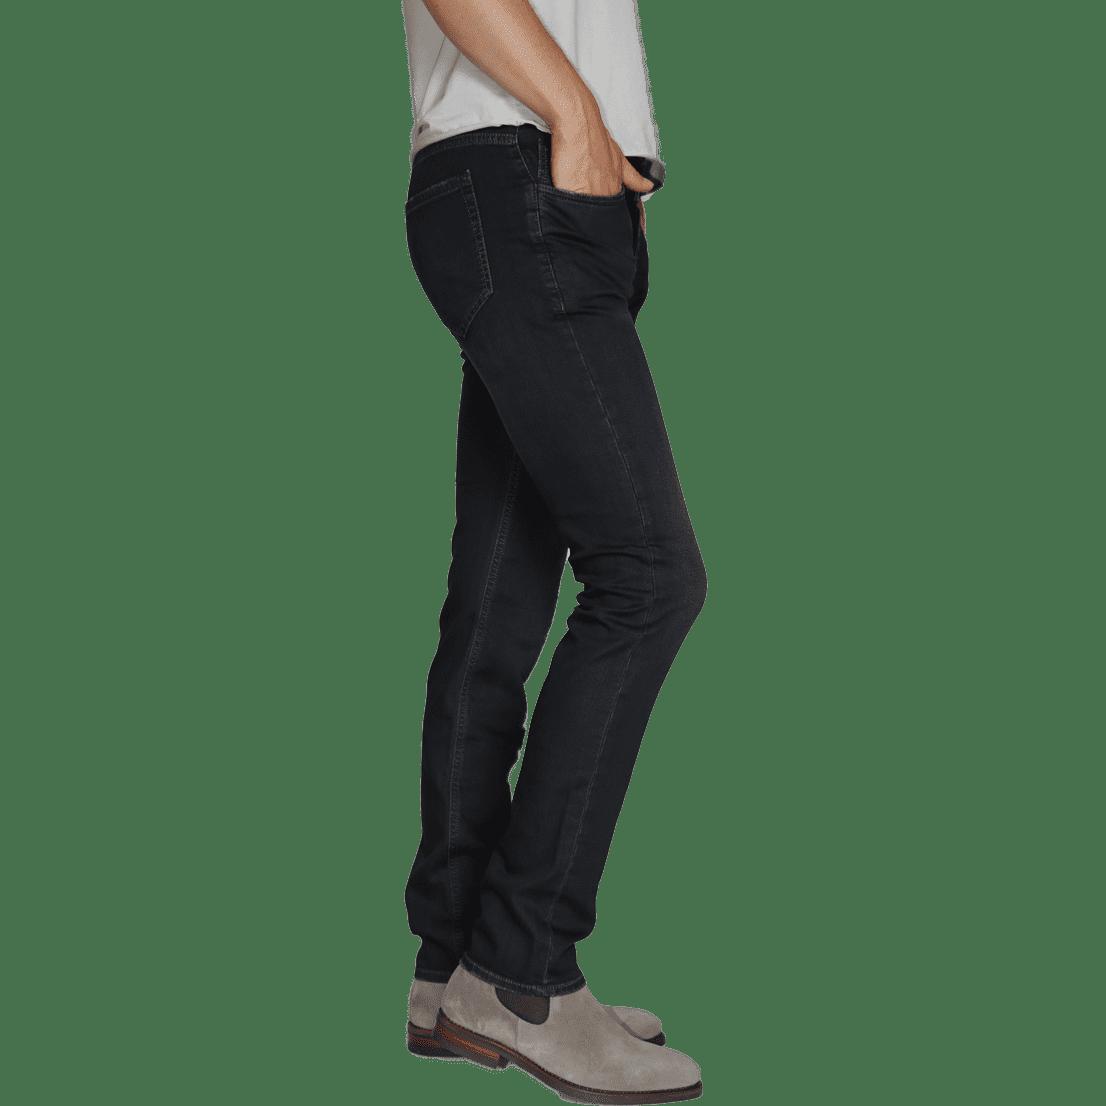 Cabinero Stiles Berlin PG Enjoy Jeans, Herrenhosen, made in Italy AW17-18 denim Blue-Brown 2